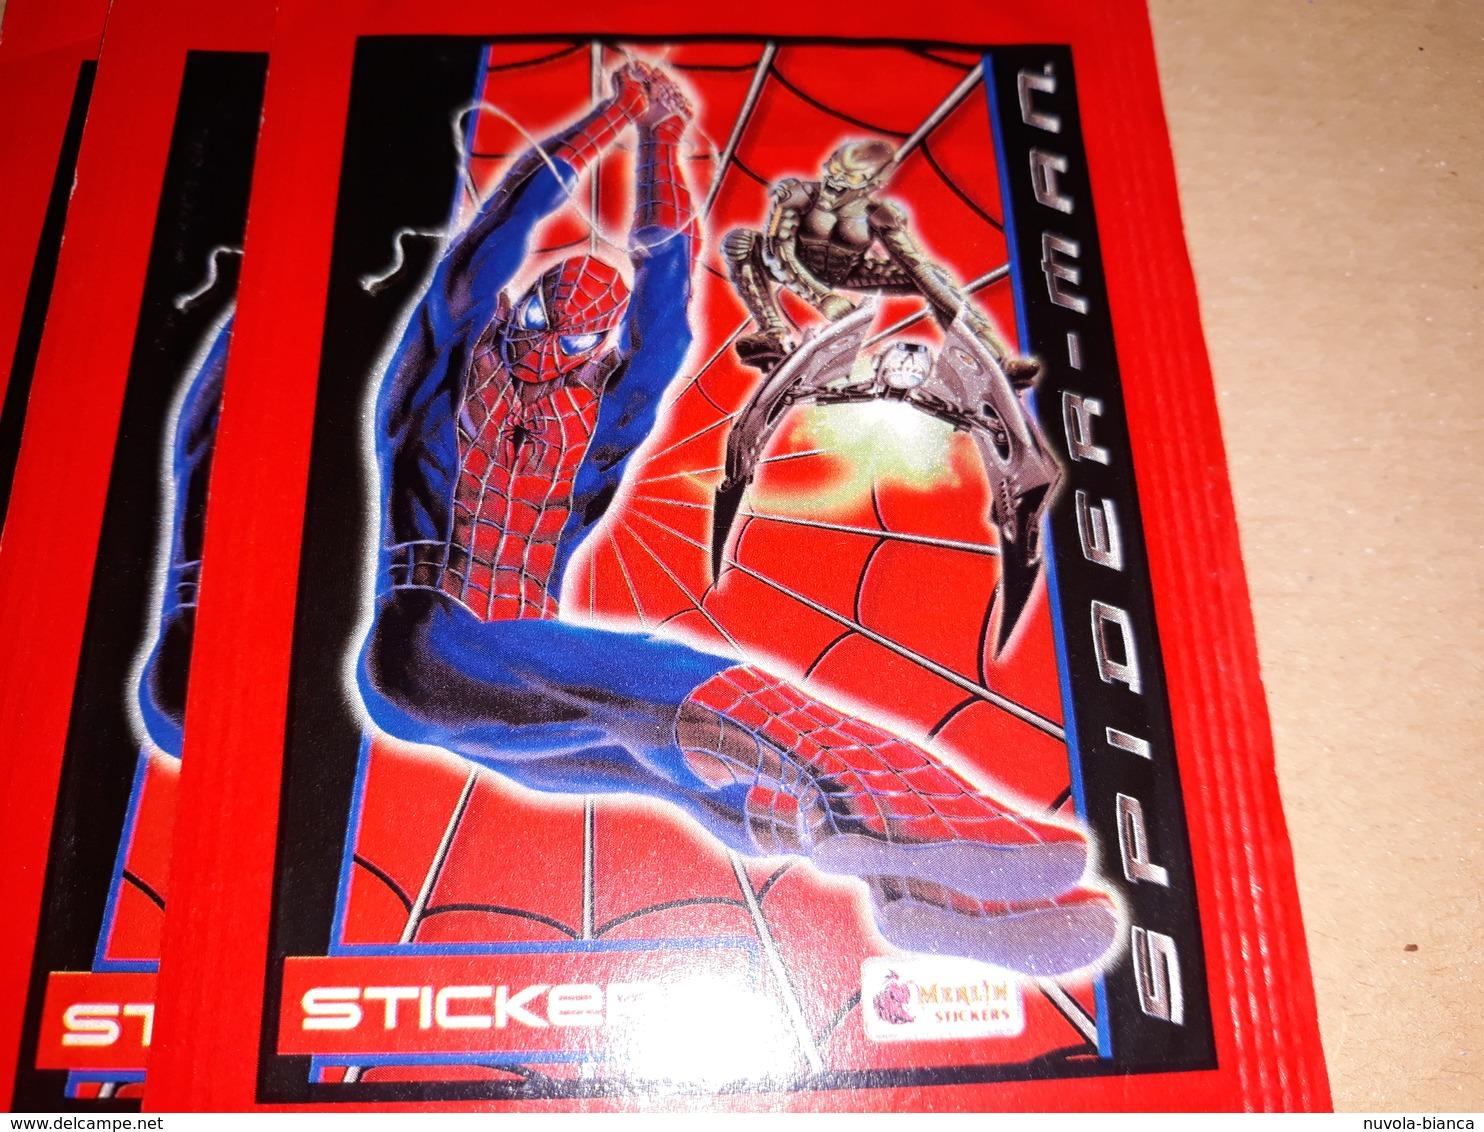 Spider-man Bustina Con Figurine.merlin - Adesivi